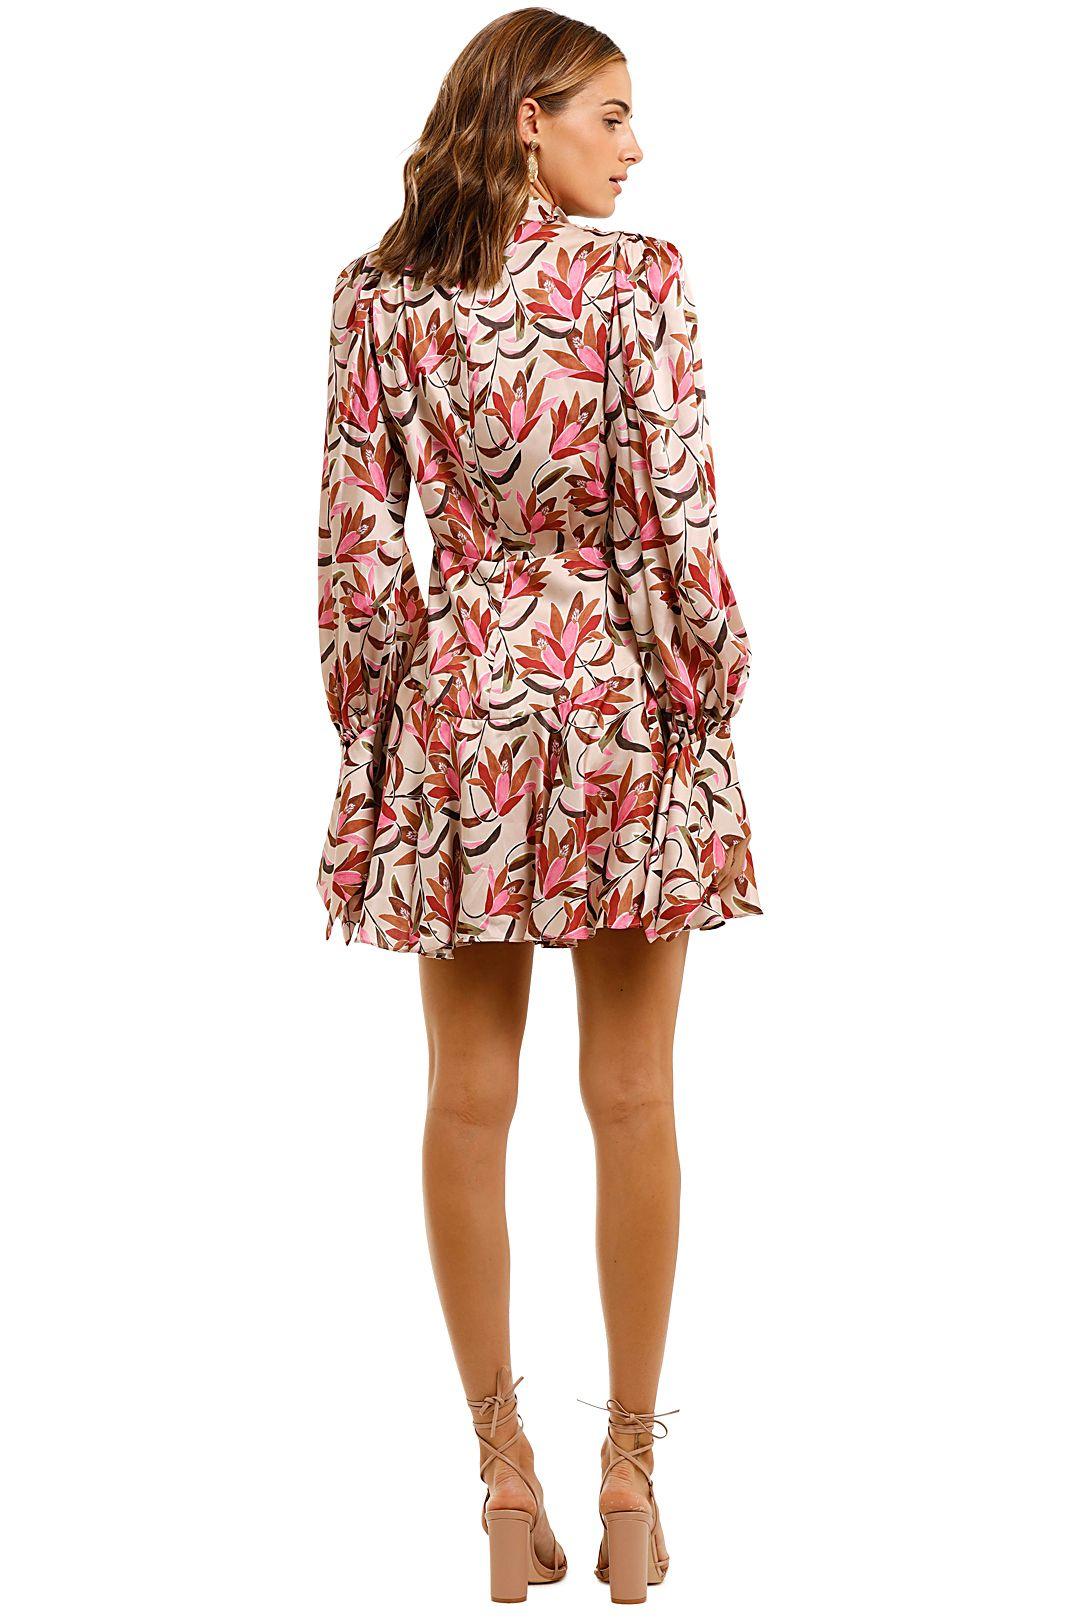 Acler Coleman Mini Dress Draped